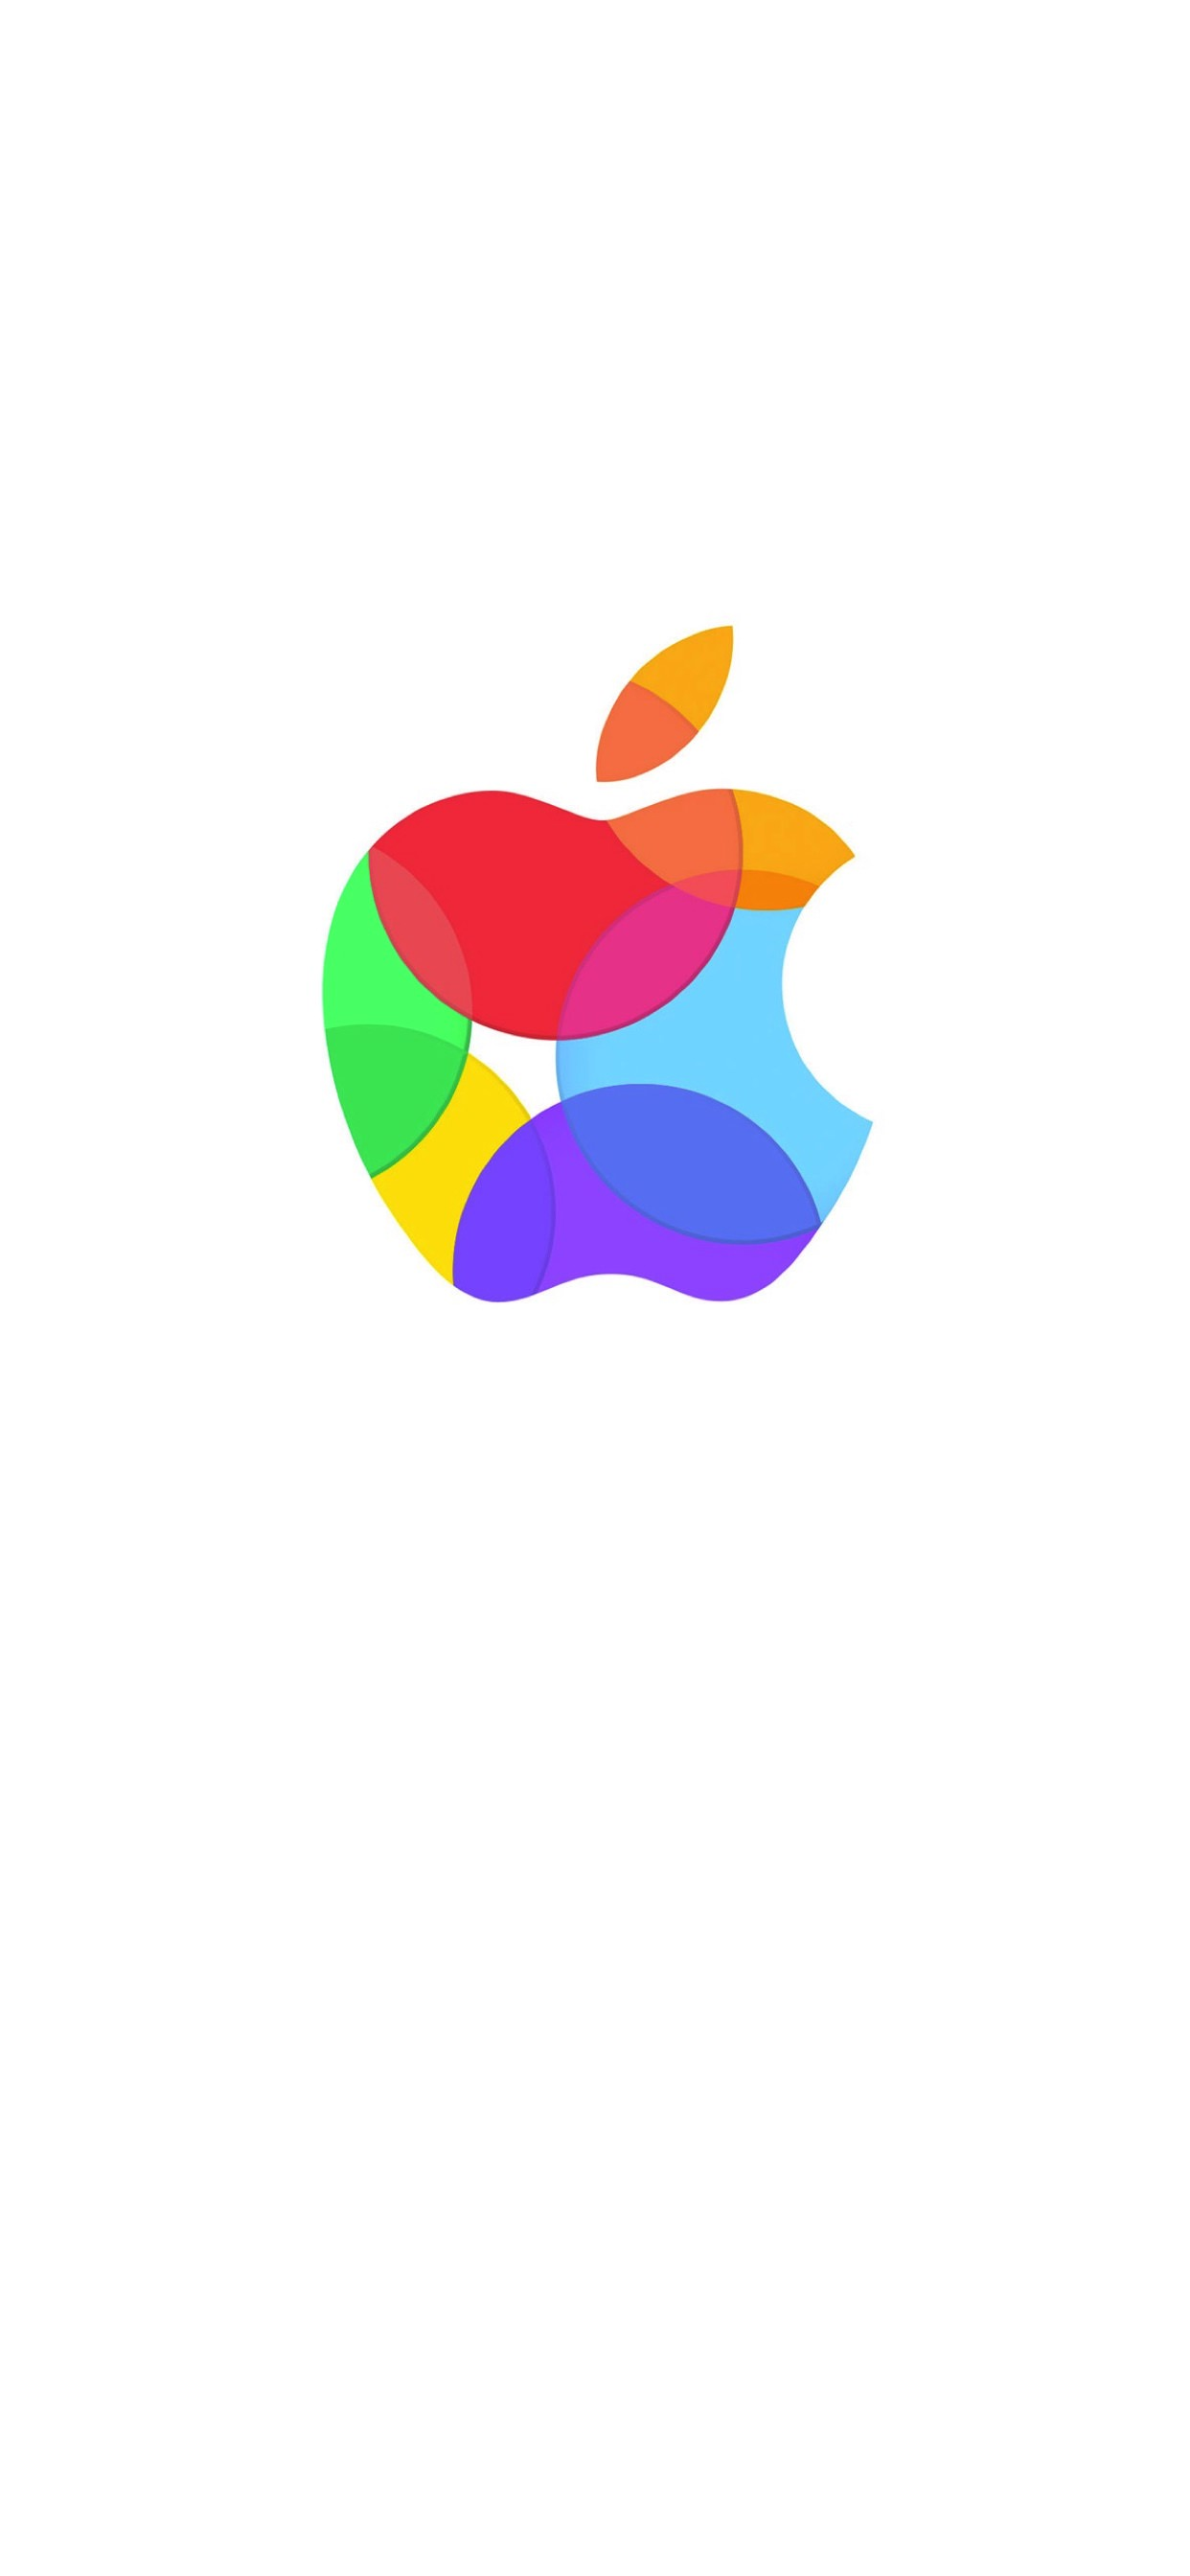 Appleロゴカラフル白 Wallpaper Sc Iphone Xs Max壁紙